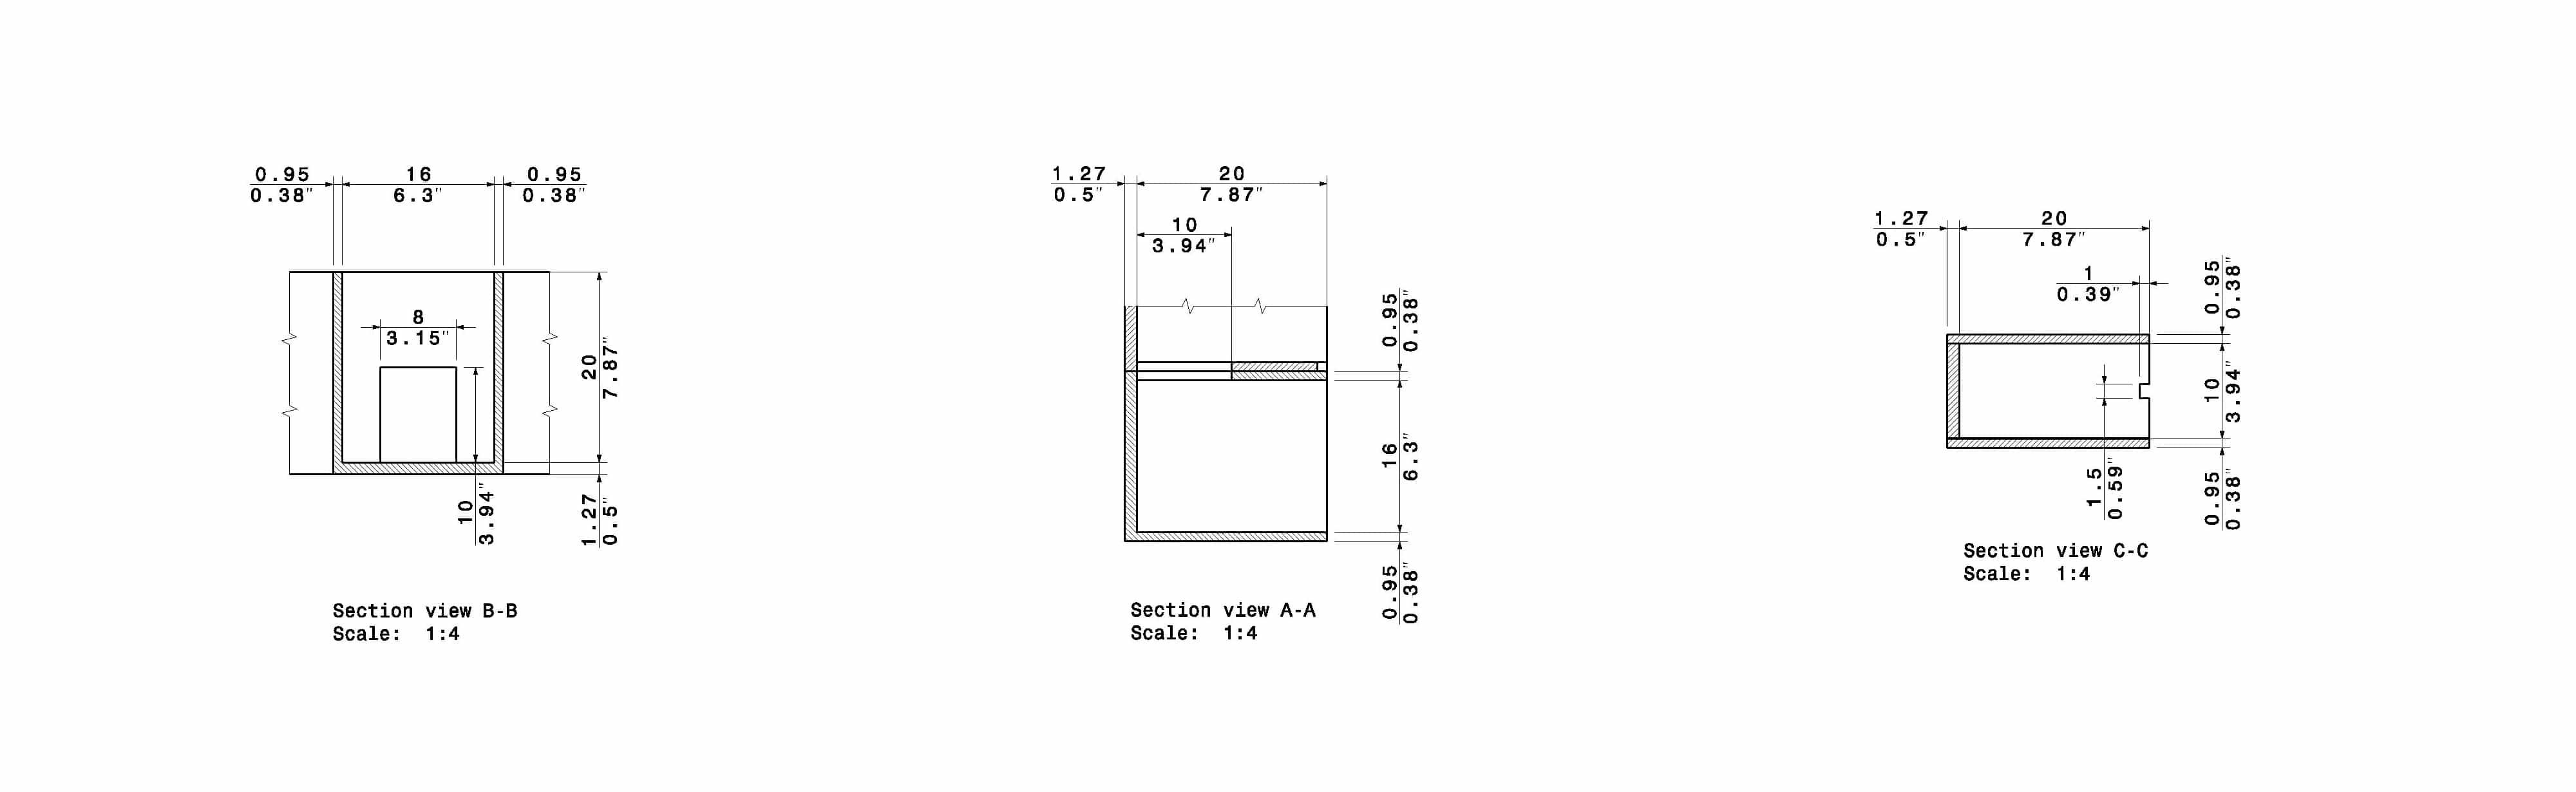 Radial Arm Maze - Rat Goal Box - Image 3